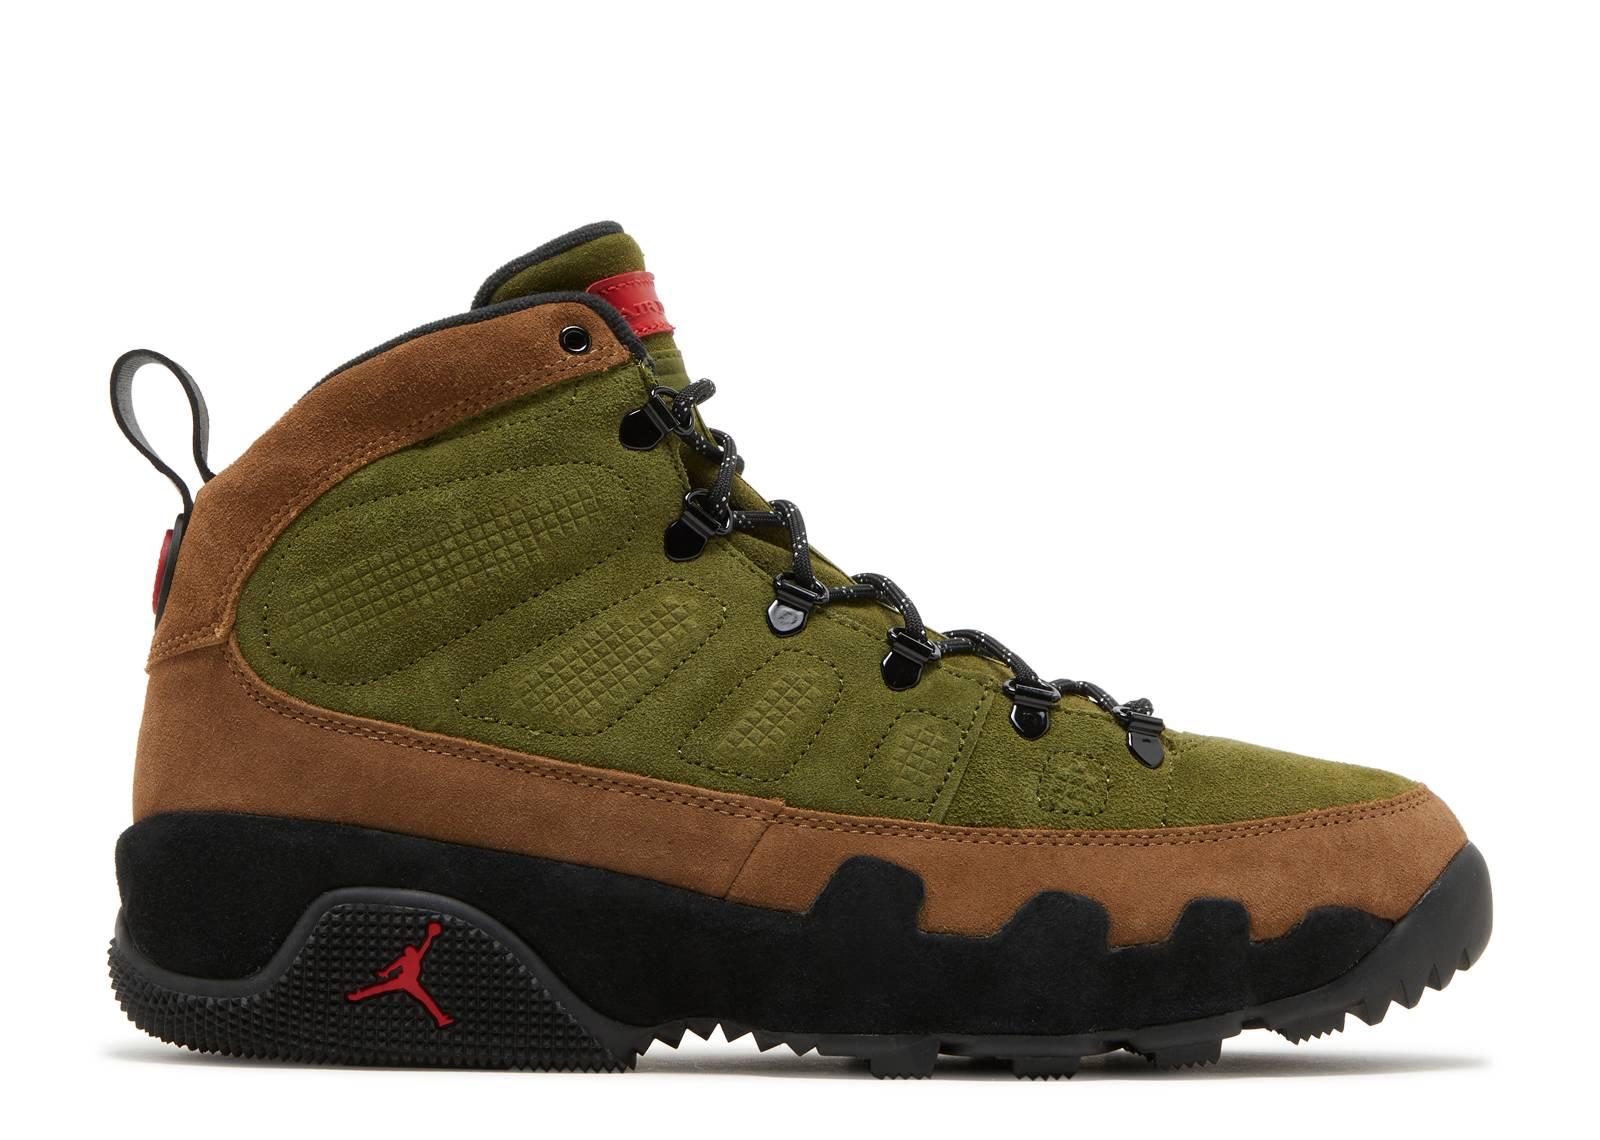 new product 0876d 337c7 Air Jordan 9 Retro Boot NRG